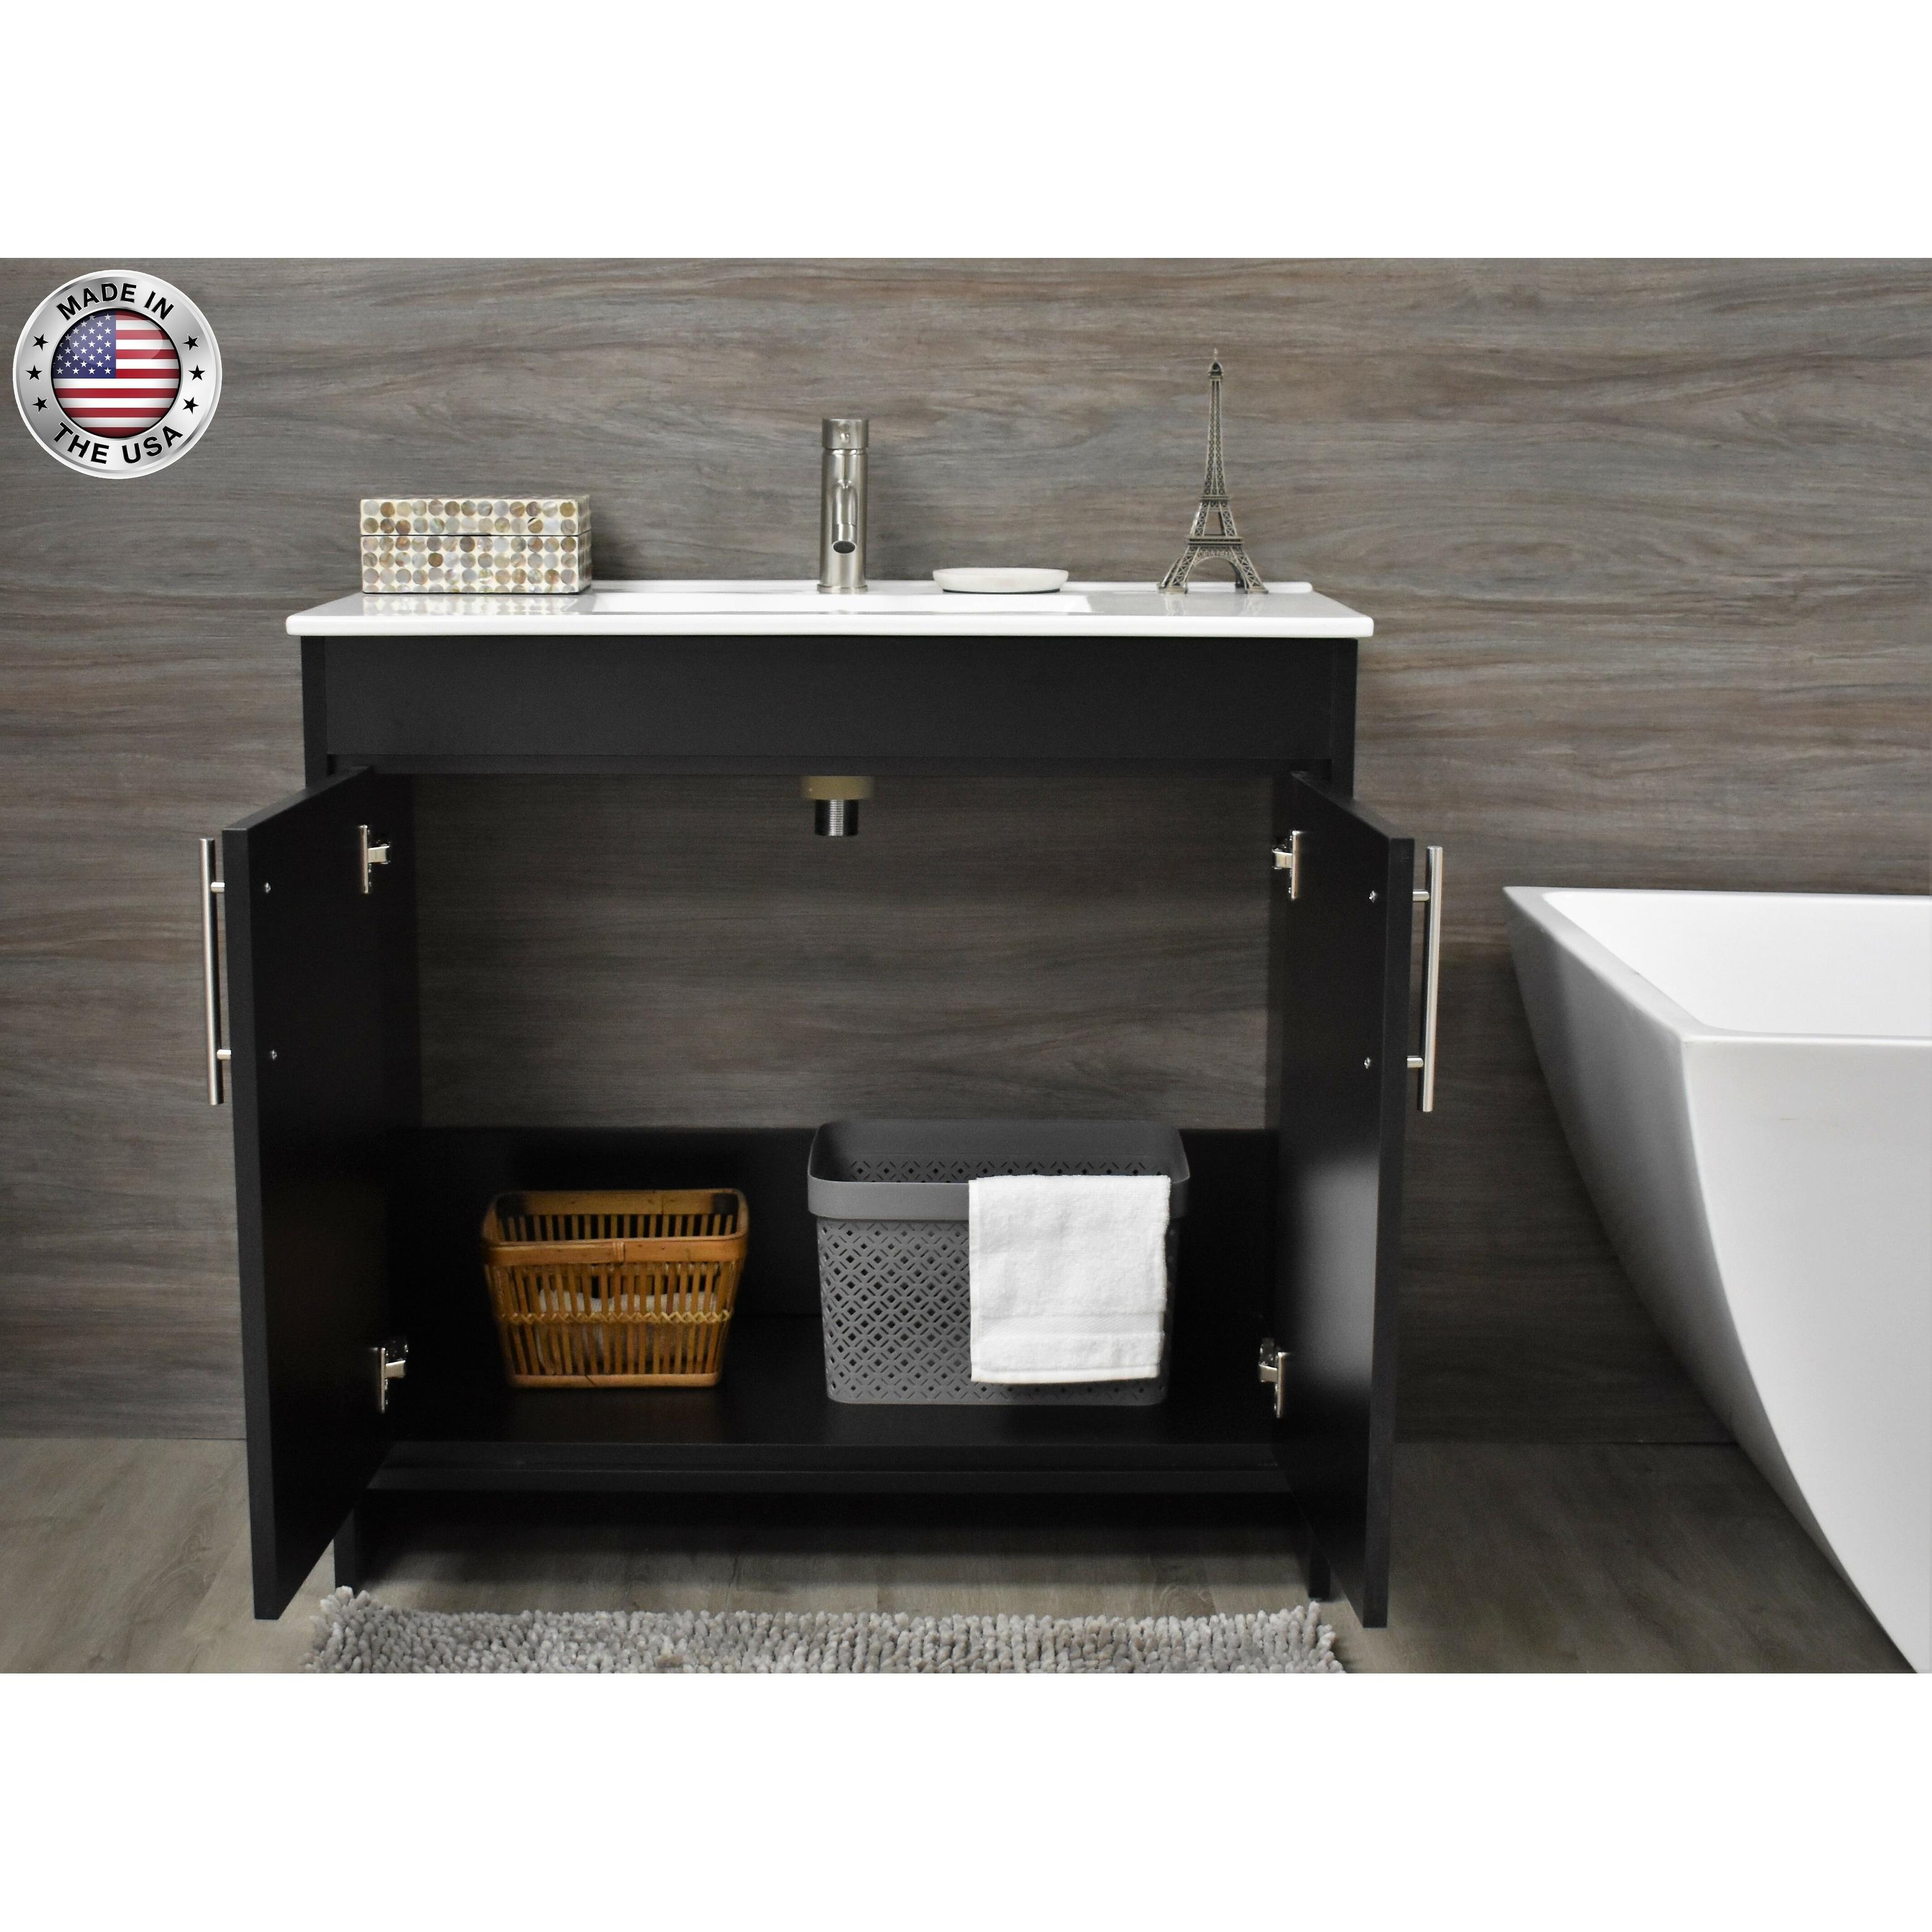 Volpa Usa Villa 36 Inch Black Freestanding Bathroom Vanity Set Overstock 32524596